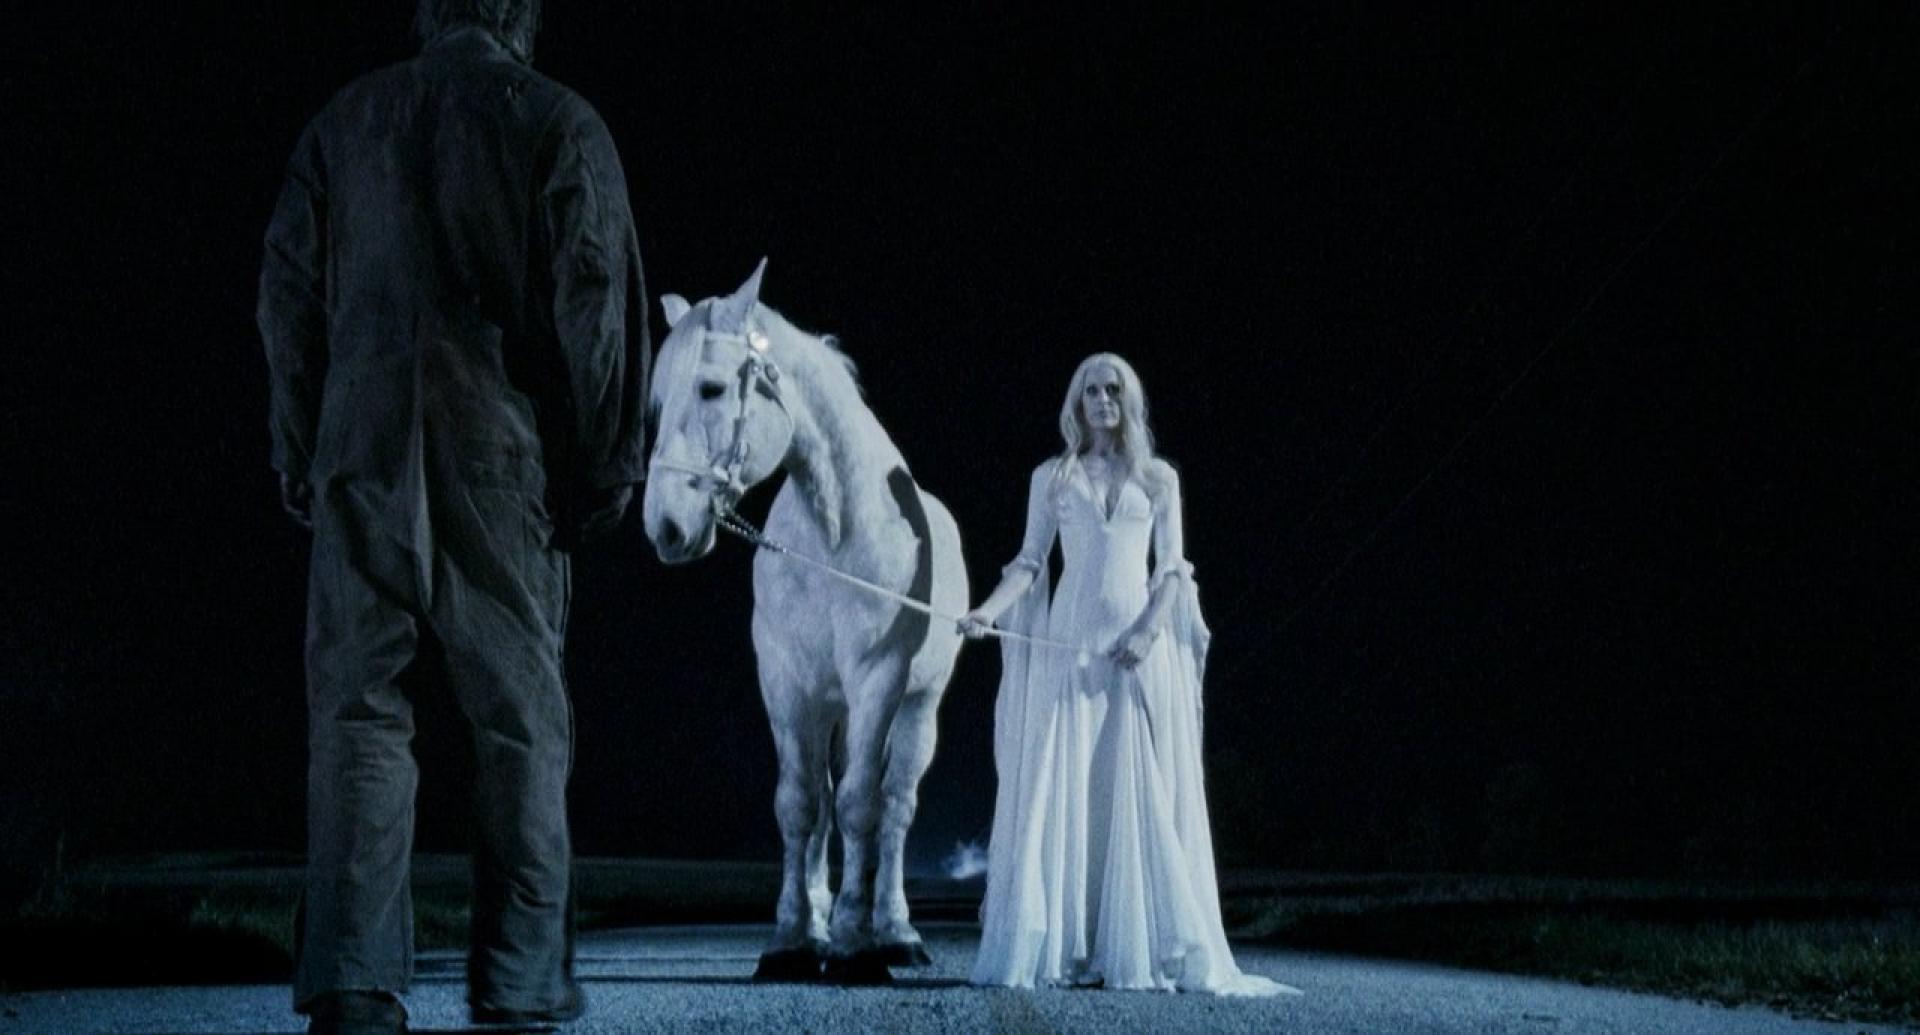 Halloween II (2009) 2.kép